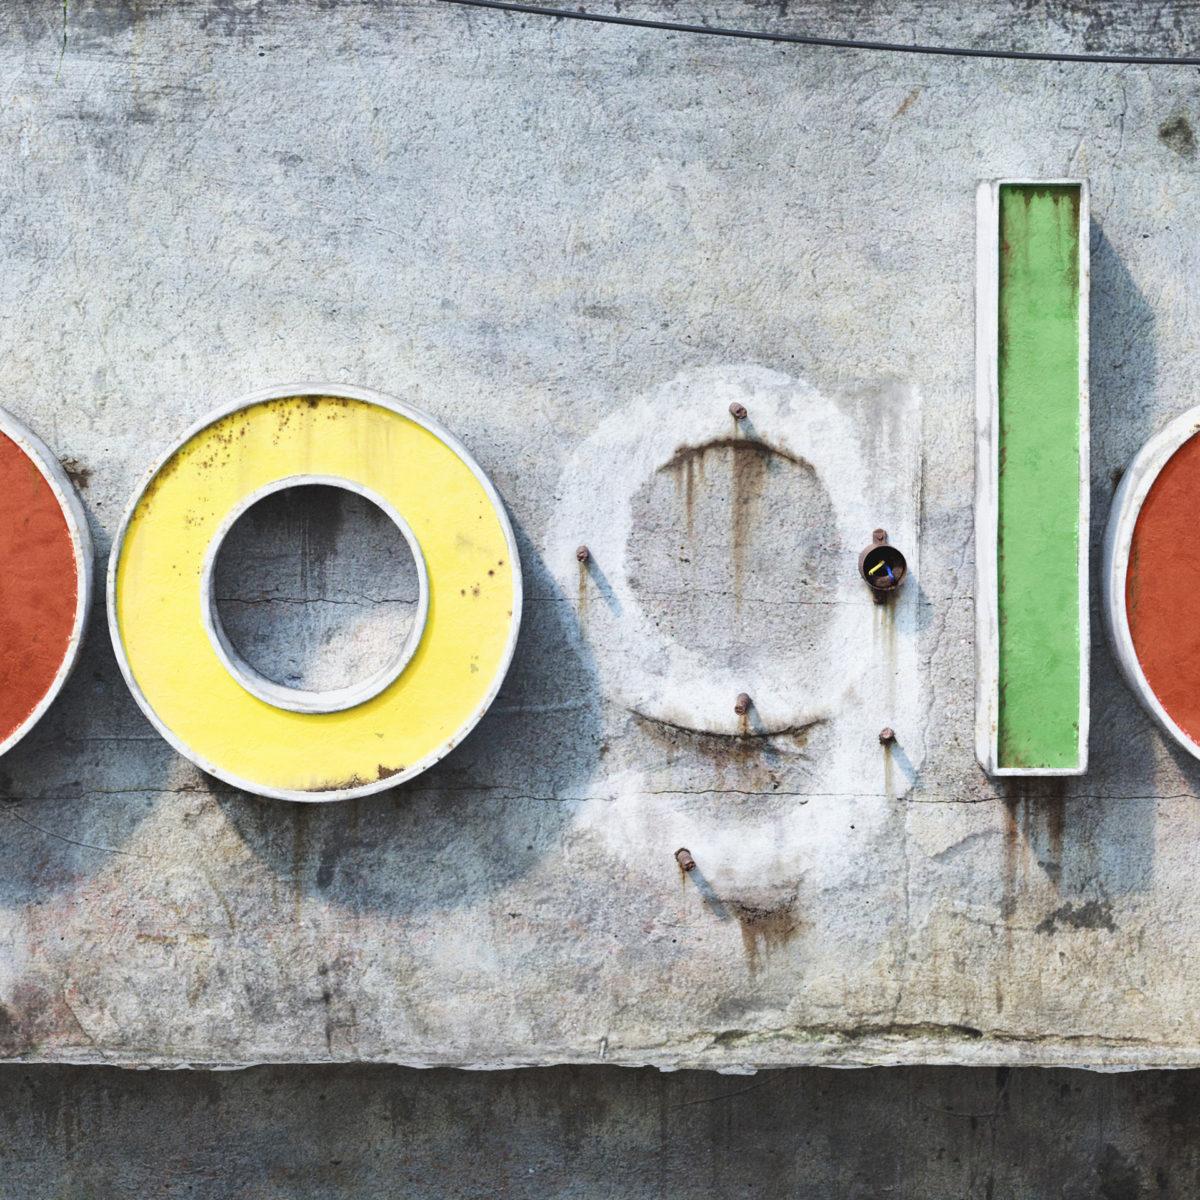 AndreiLacatusu social decay lettres logo enseigne typographie urbain urbex google detail - Social decay : les logos de Twitter, Facebook et Tinder transformés en enseignes vintage